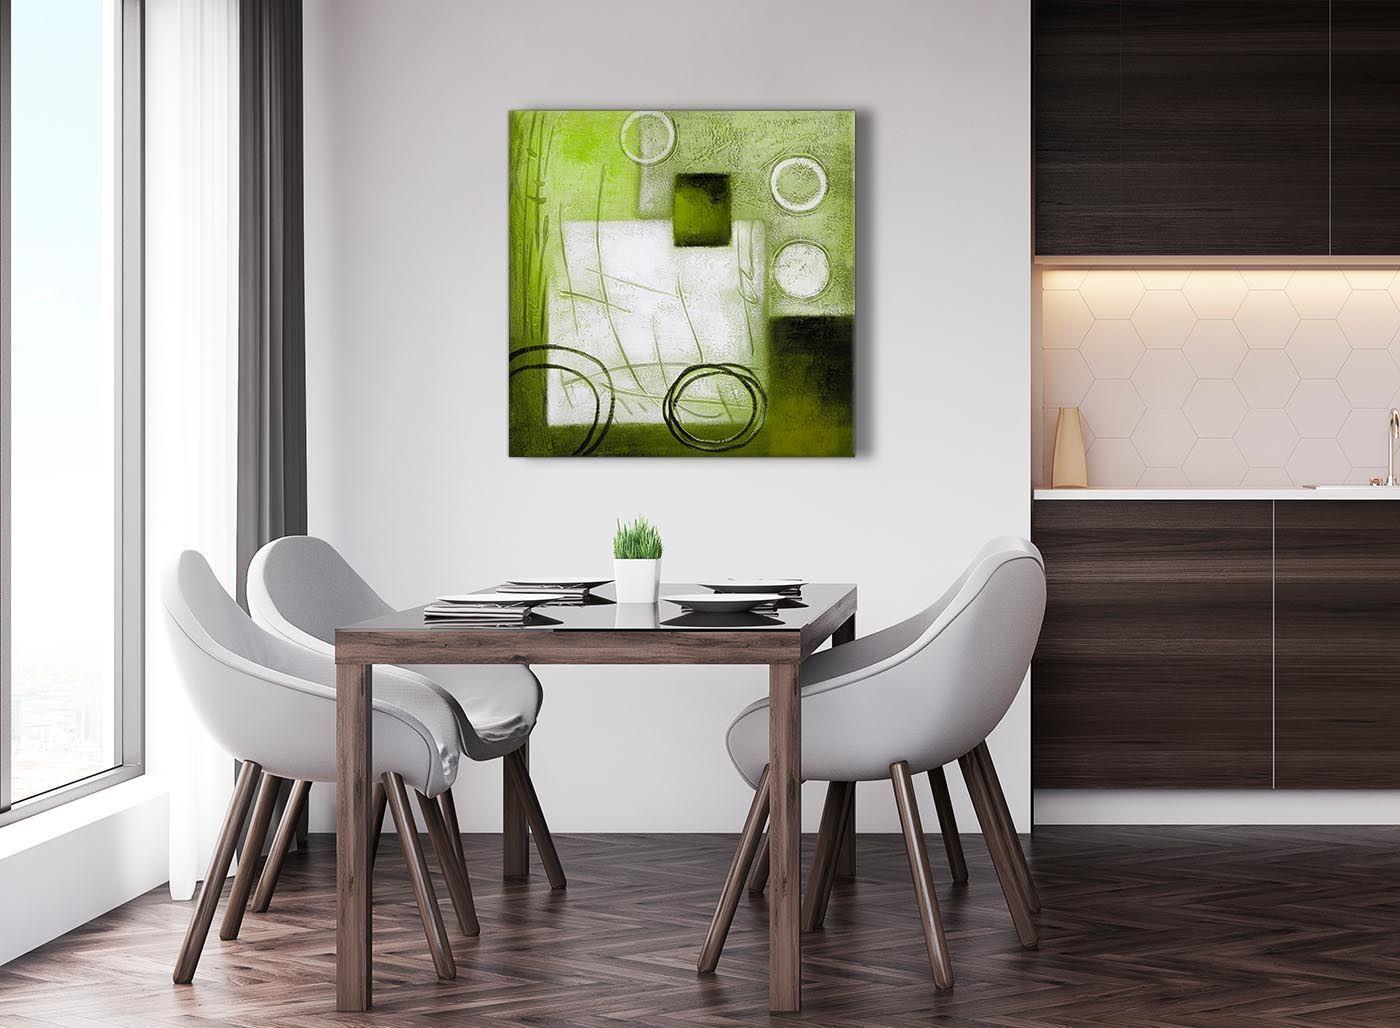 Lime Grün Painting Abstract Bedroom Canvas Pictures Decor 1s431l 1s431l 1s431l - 79cm 9da229